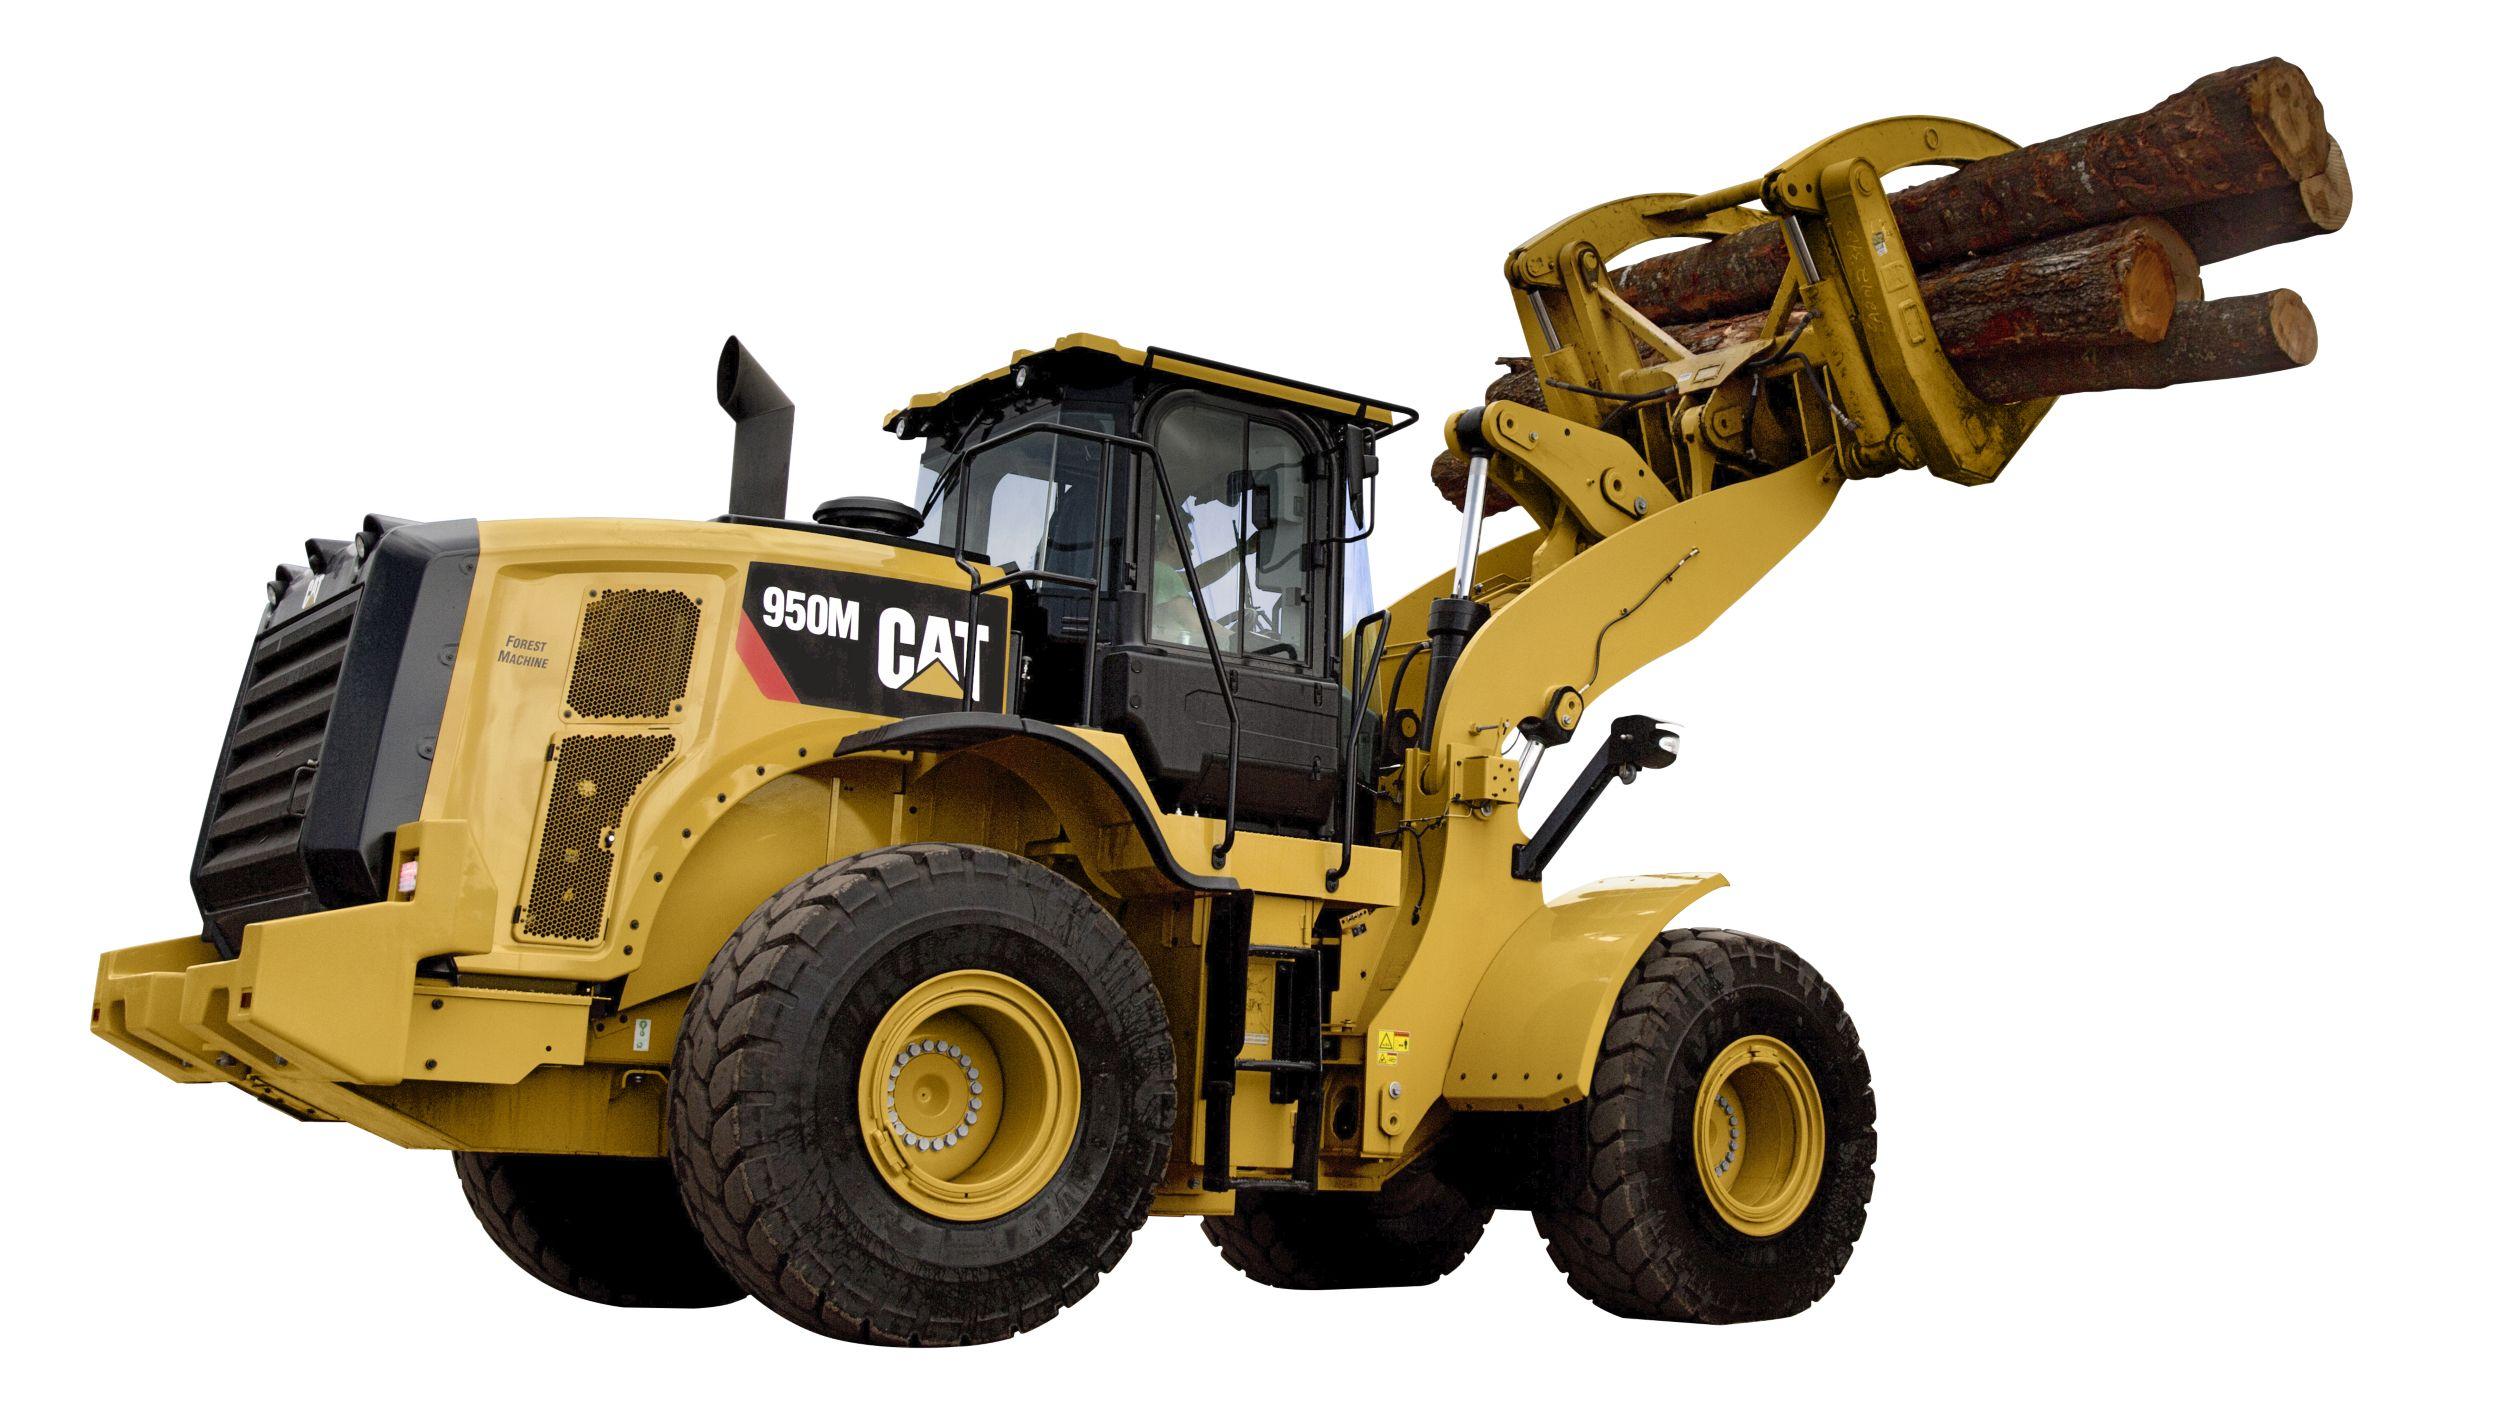 950M MILLYARD | Demolition, scrap and clean up equipment